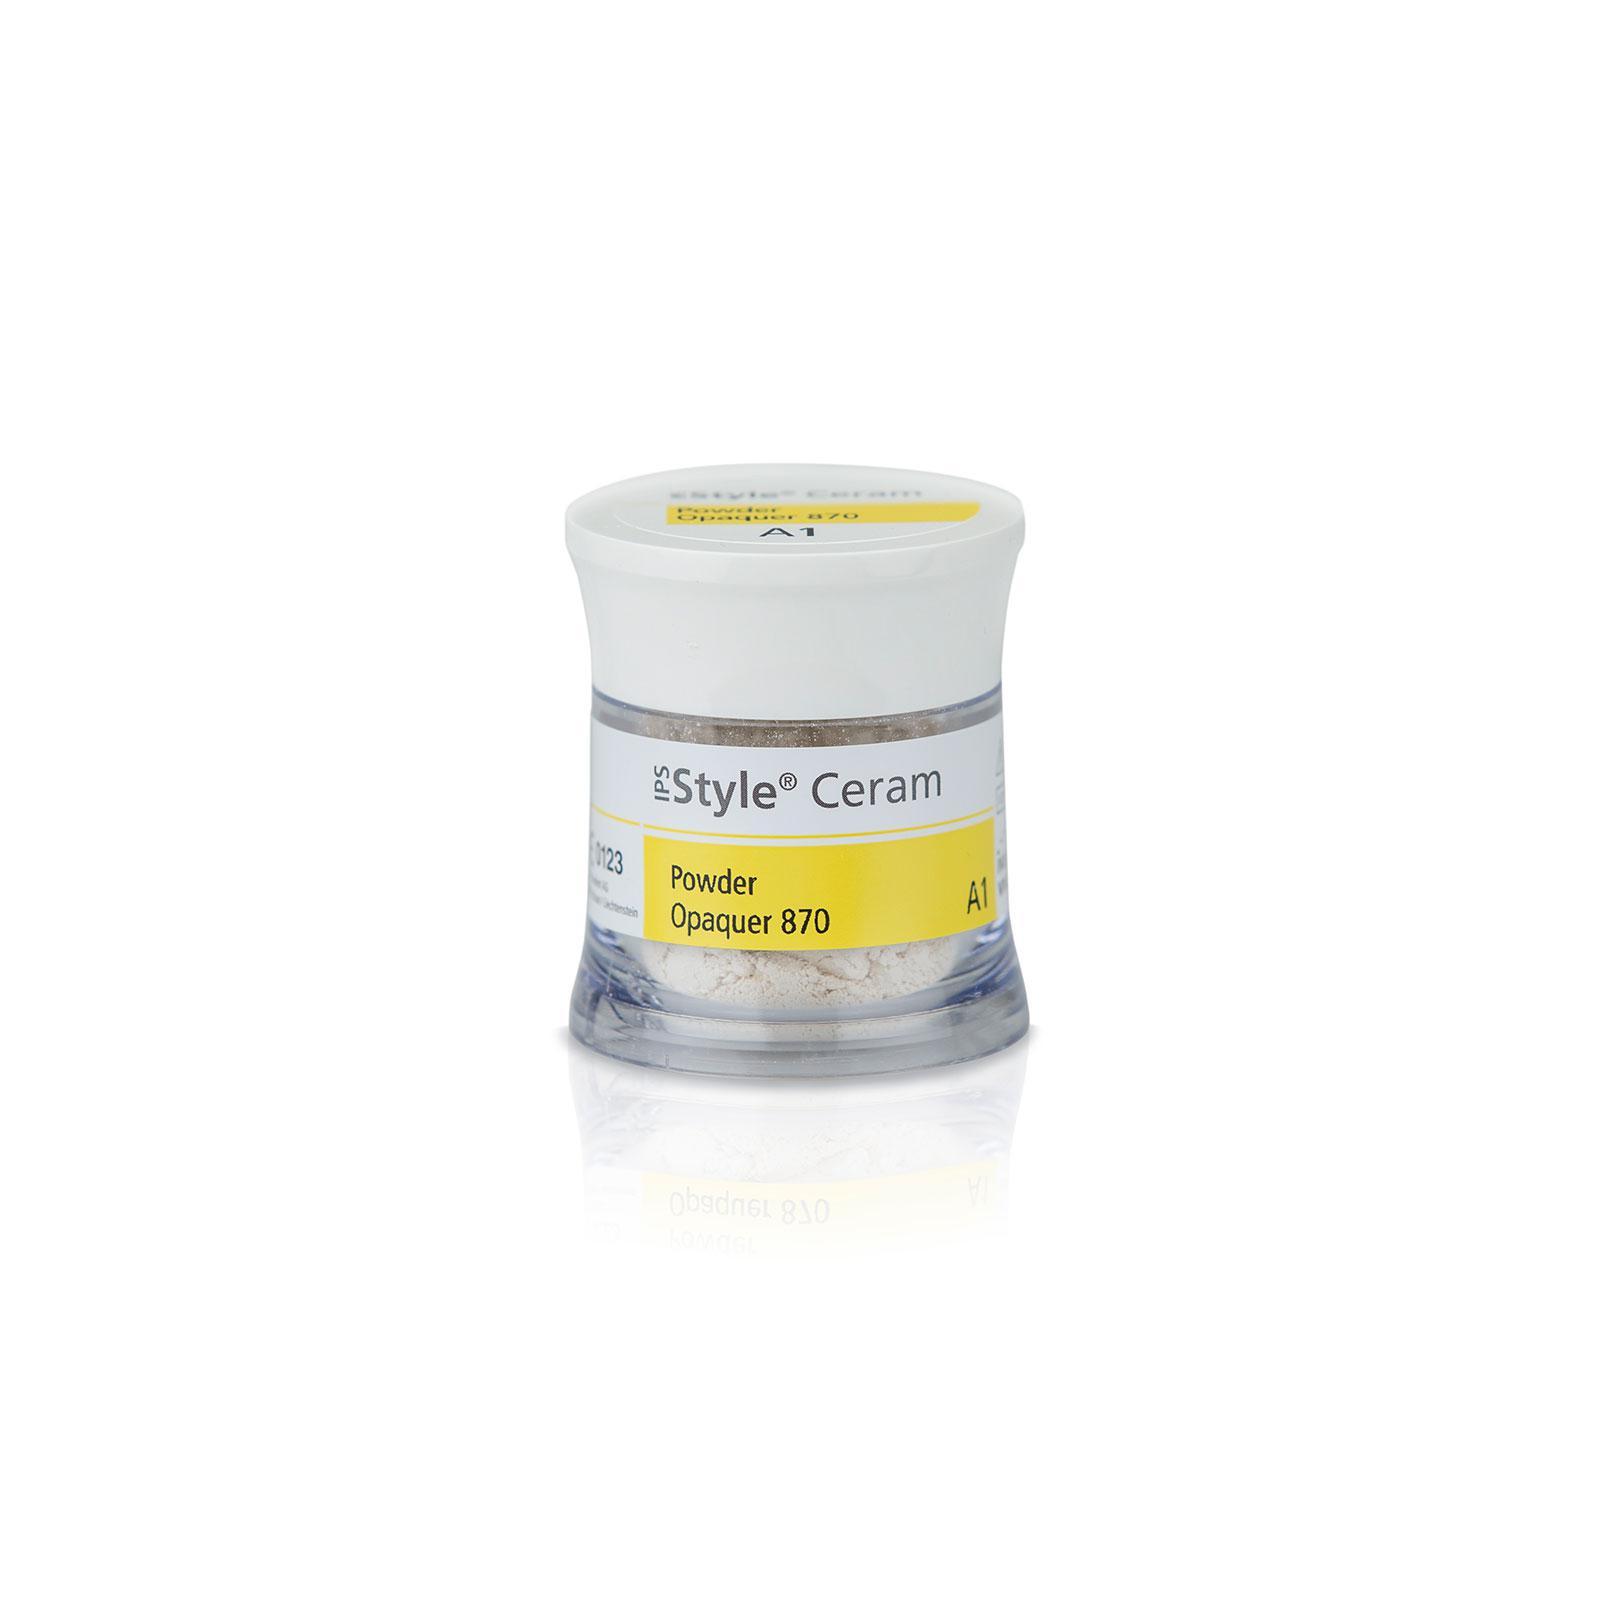 IPS Style Ceram Pow Opaquer 870 18g B1